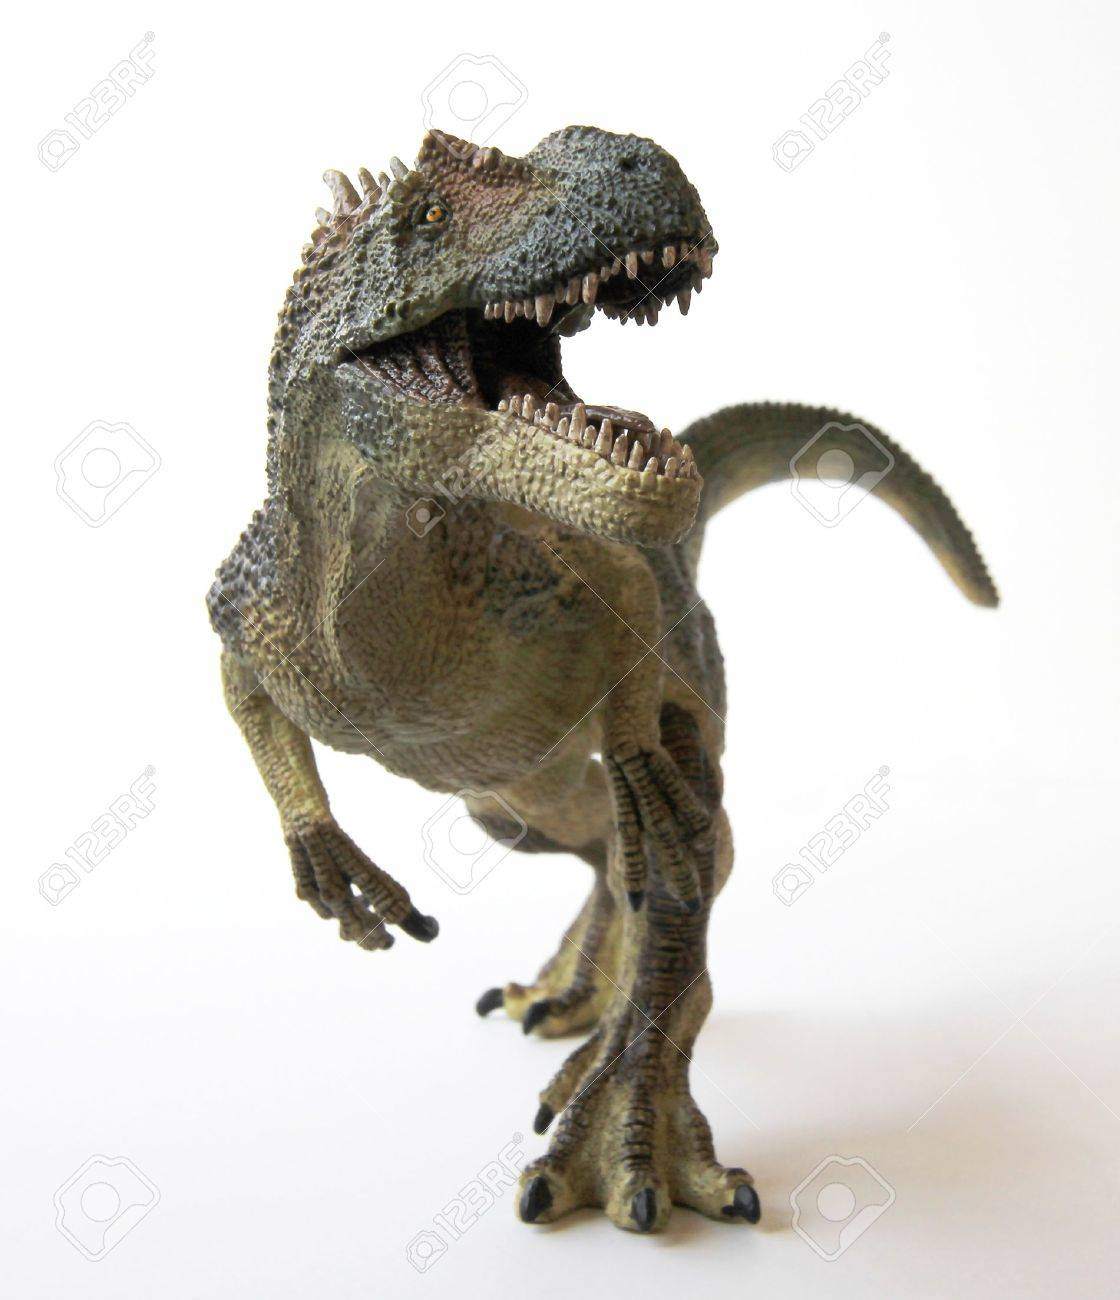 An Allosaurus Dinosaur with Gaping Jaws Full of Sharp Teeth - 9010379